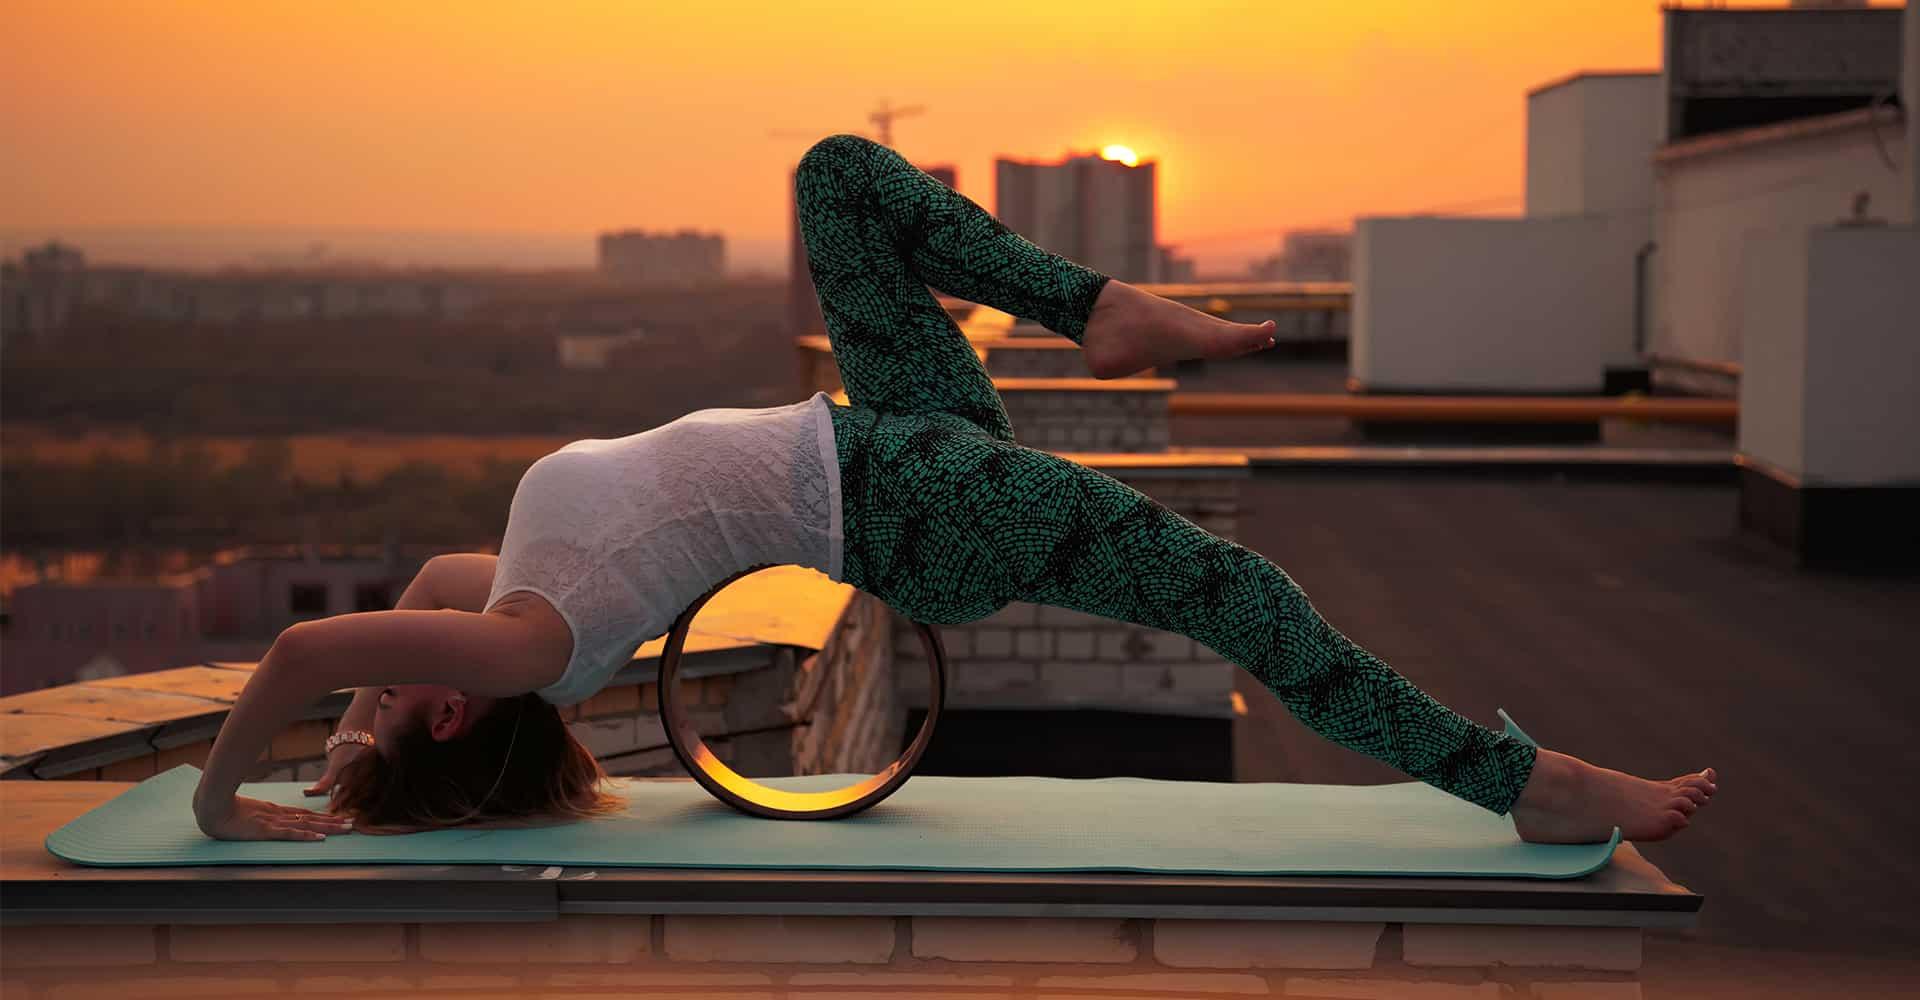 e0c1b2821b 5 Best Yoga Wheels Reviewed For Deep Poses & Better Flexibility [2019]